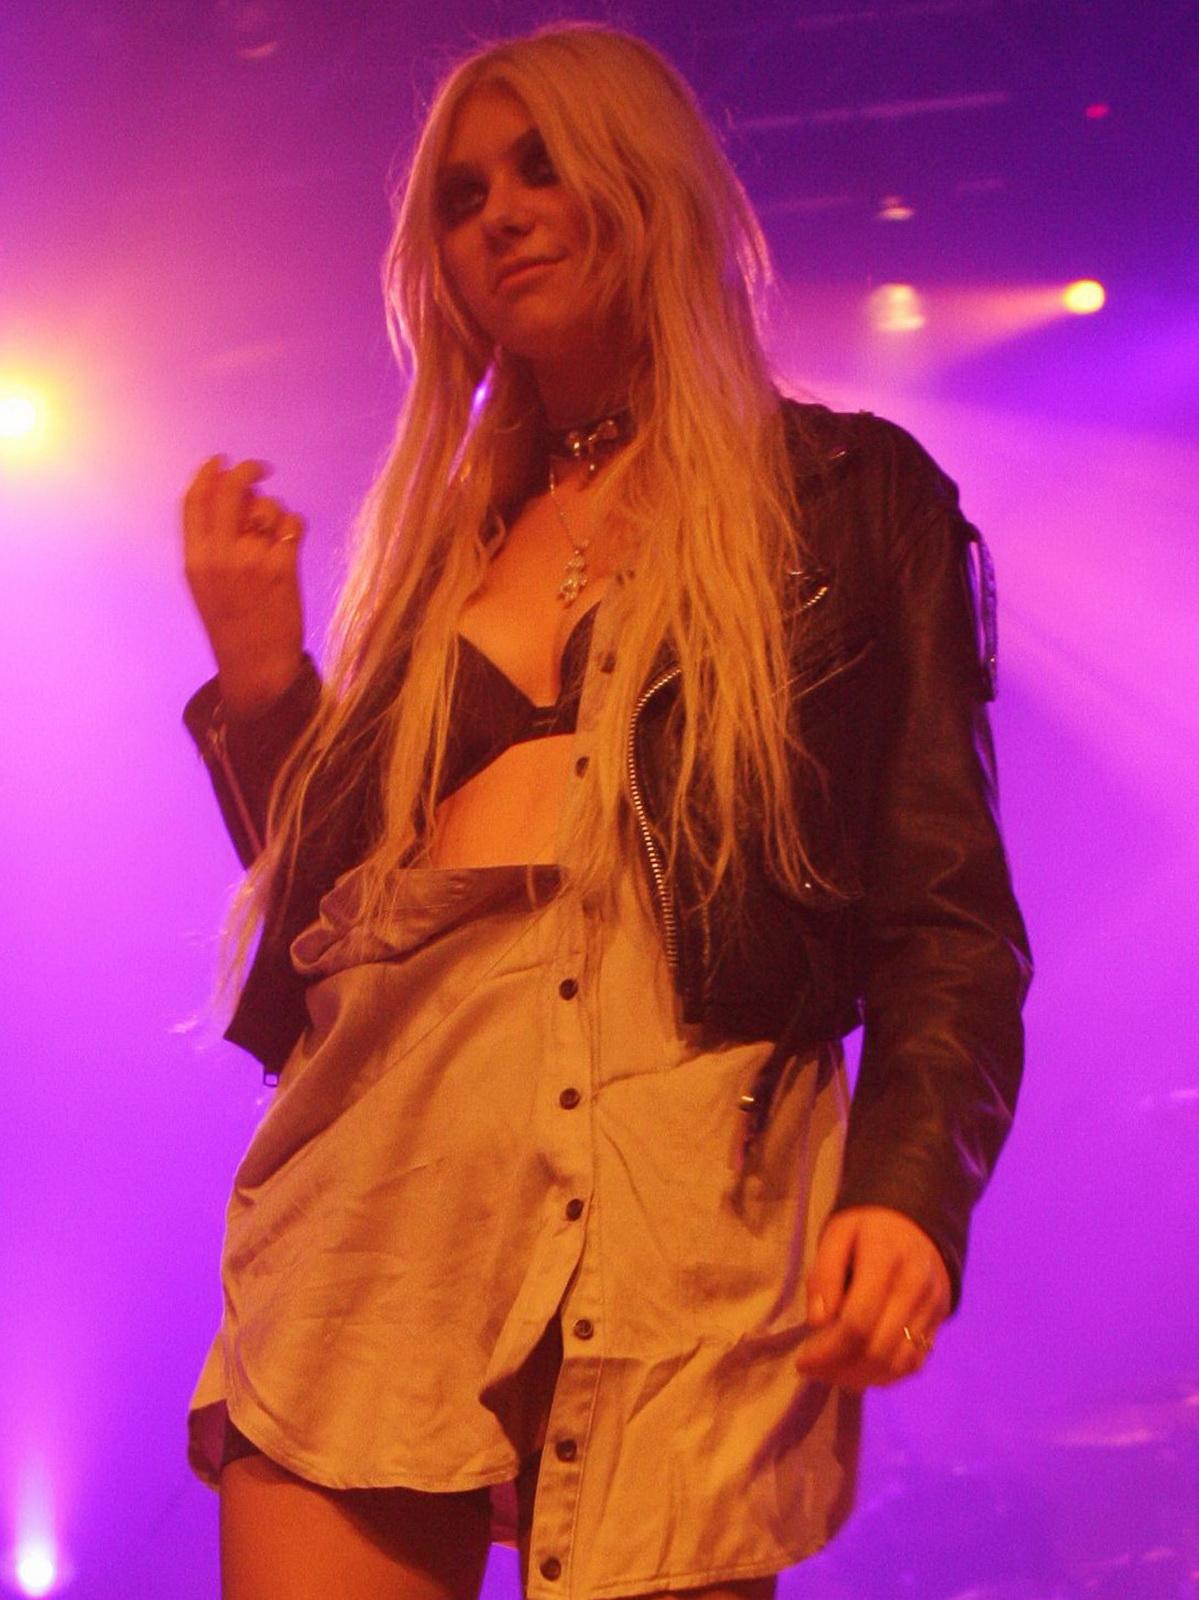 http://2.bp.blogspot.com/_NRGPIrDtEg8/TQswhACRwwI/AAAAAAAAAbQ/6hahz_2Alx8/s1600/Taylor_Momsen_cleavage_5.jpg